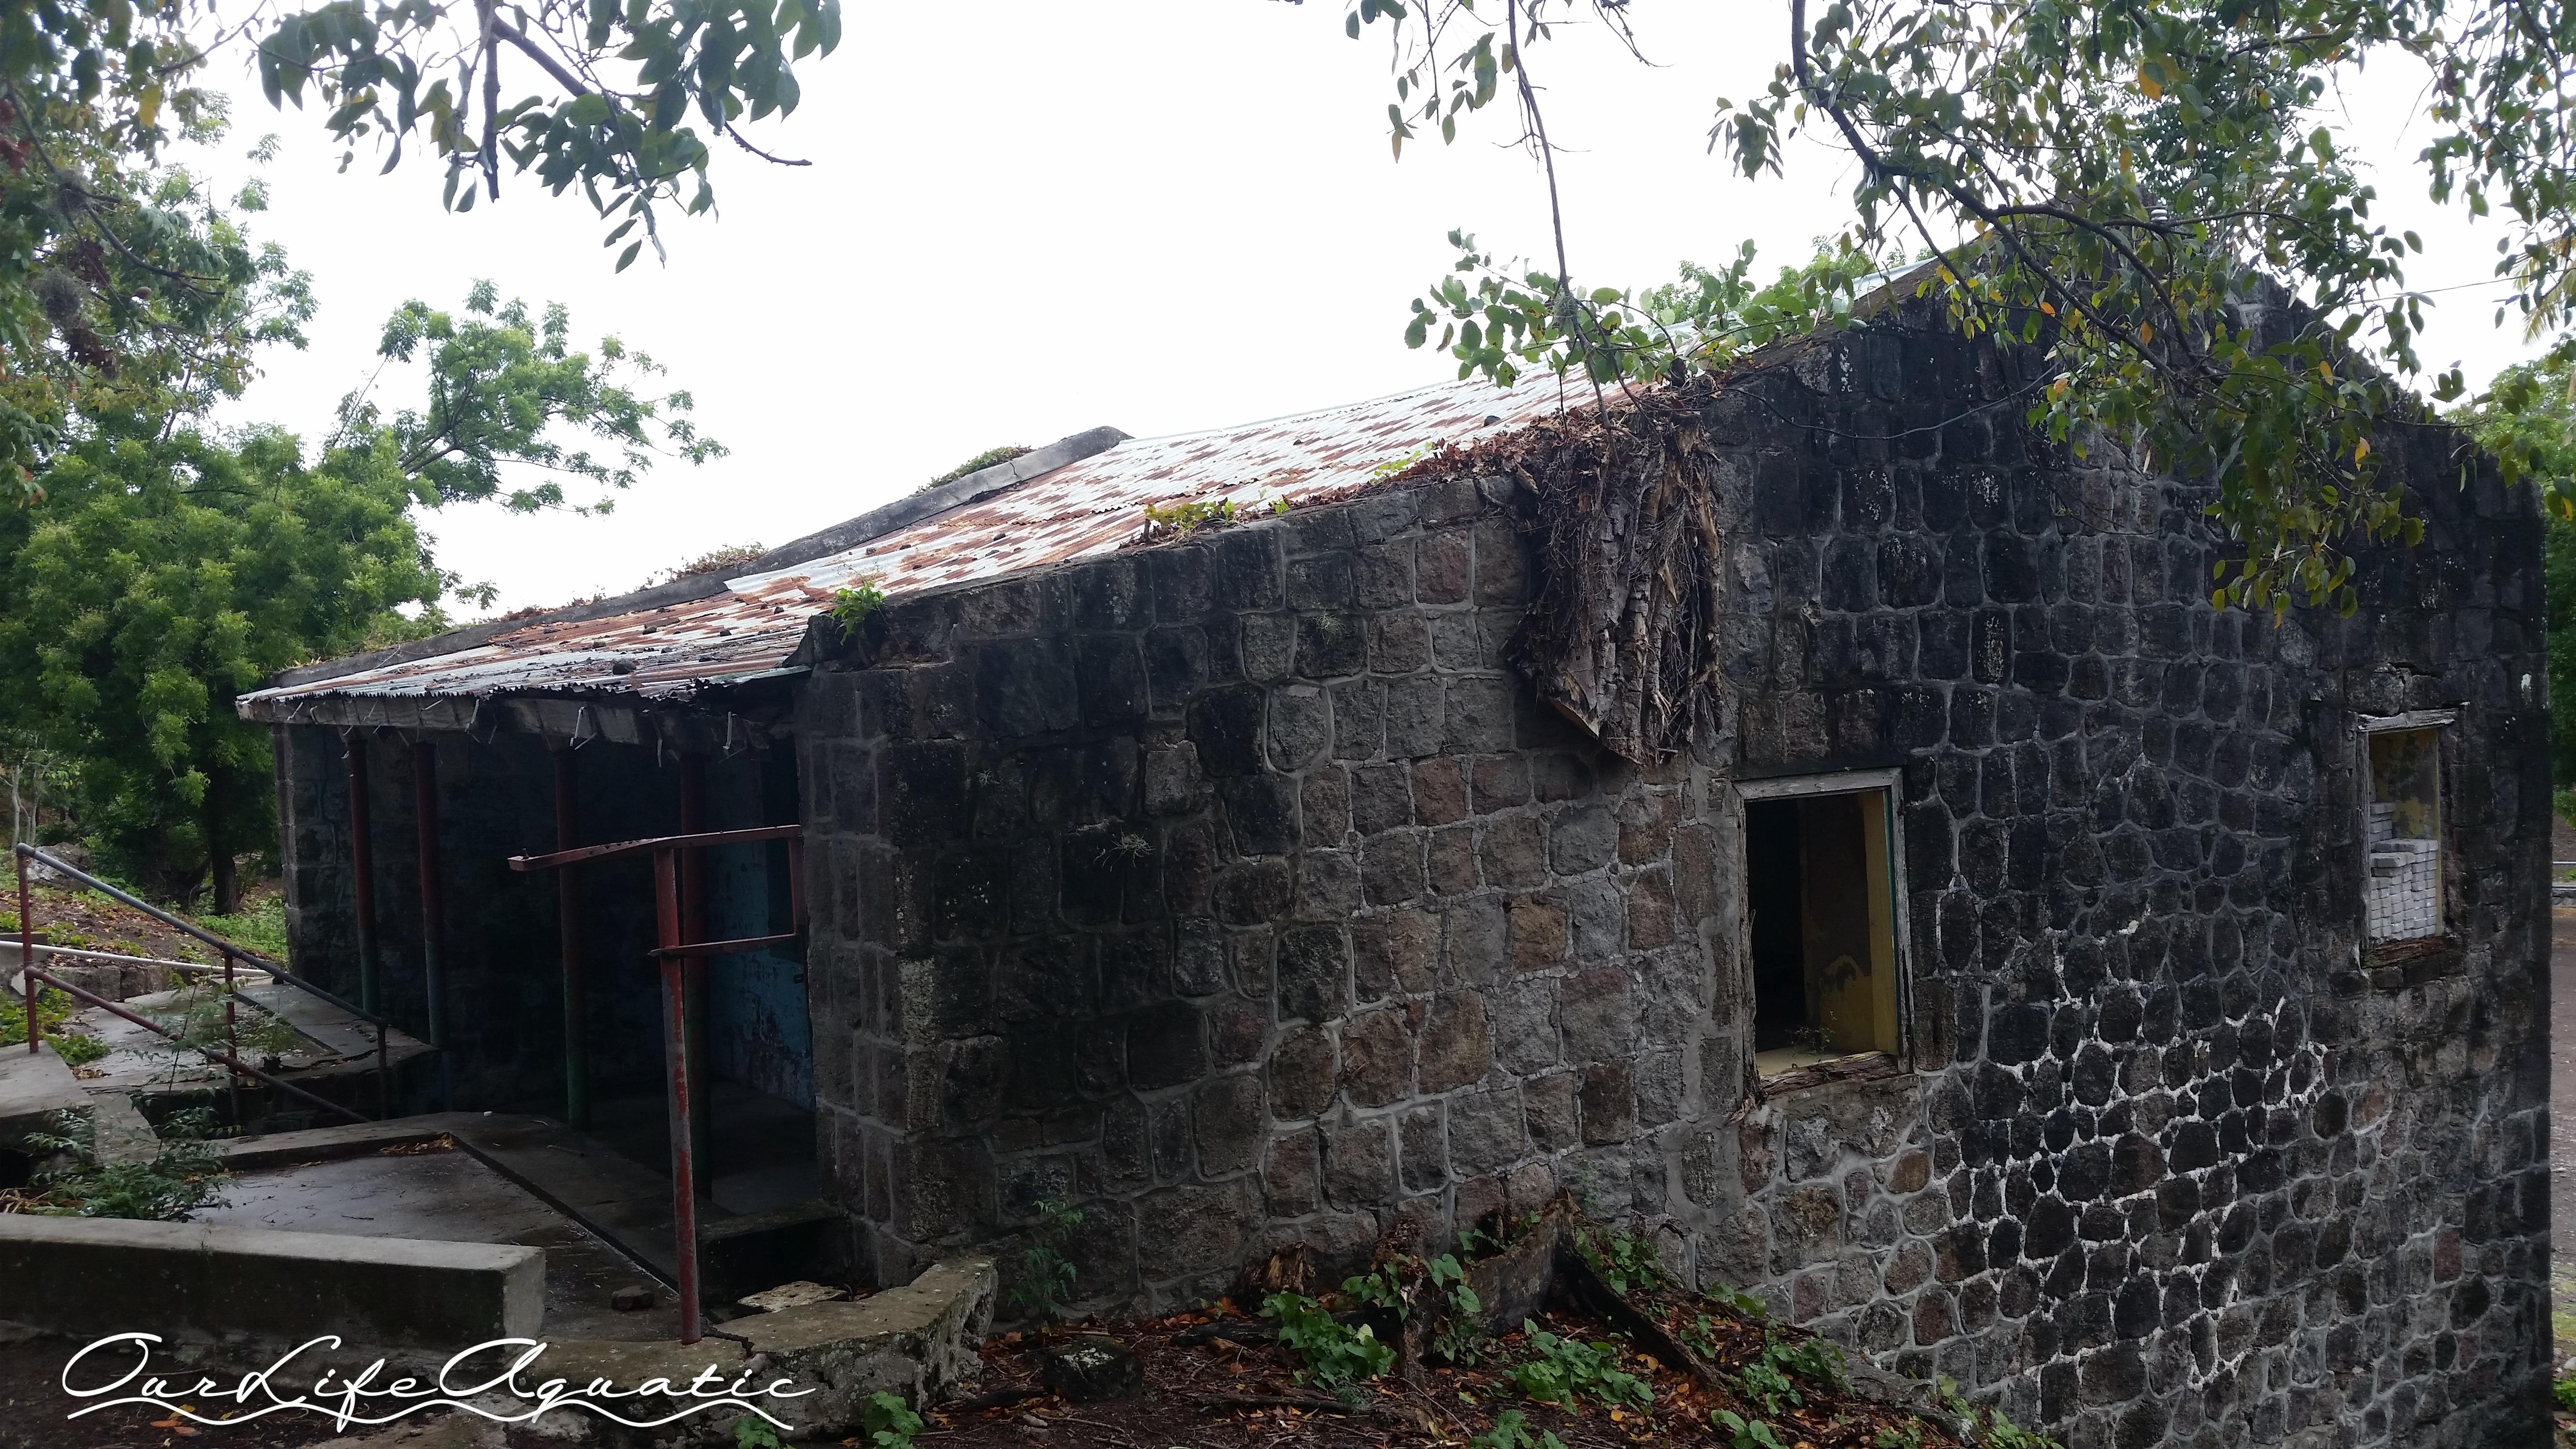 Old bathhouse ruins